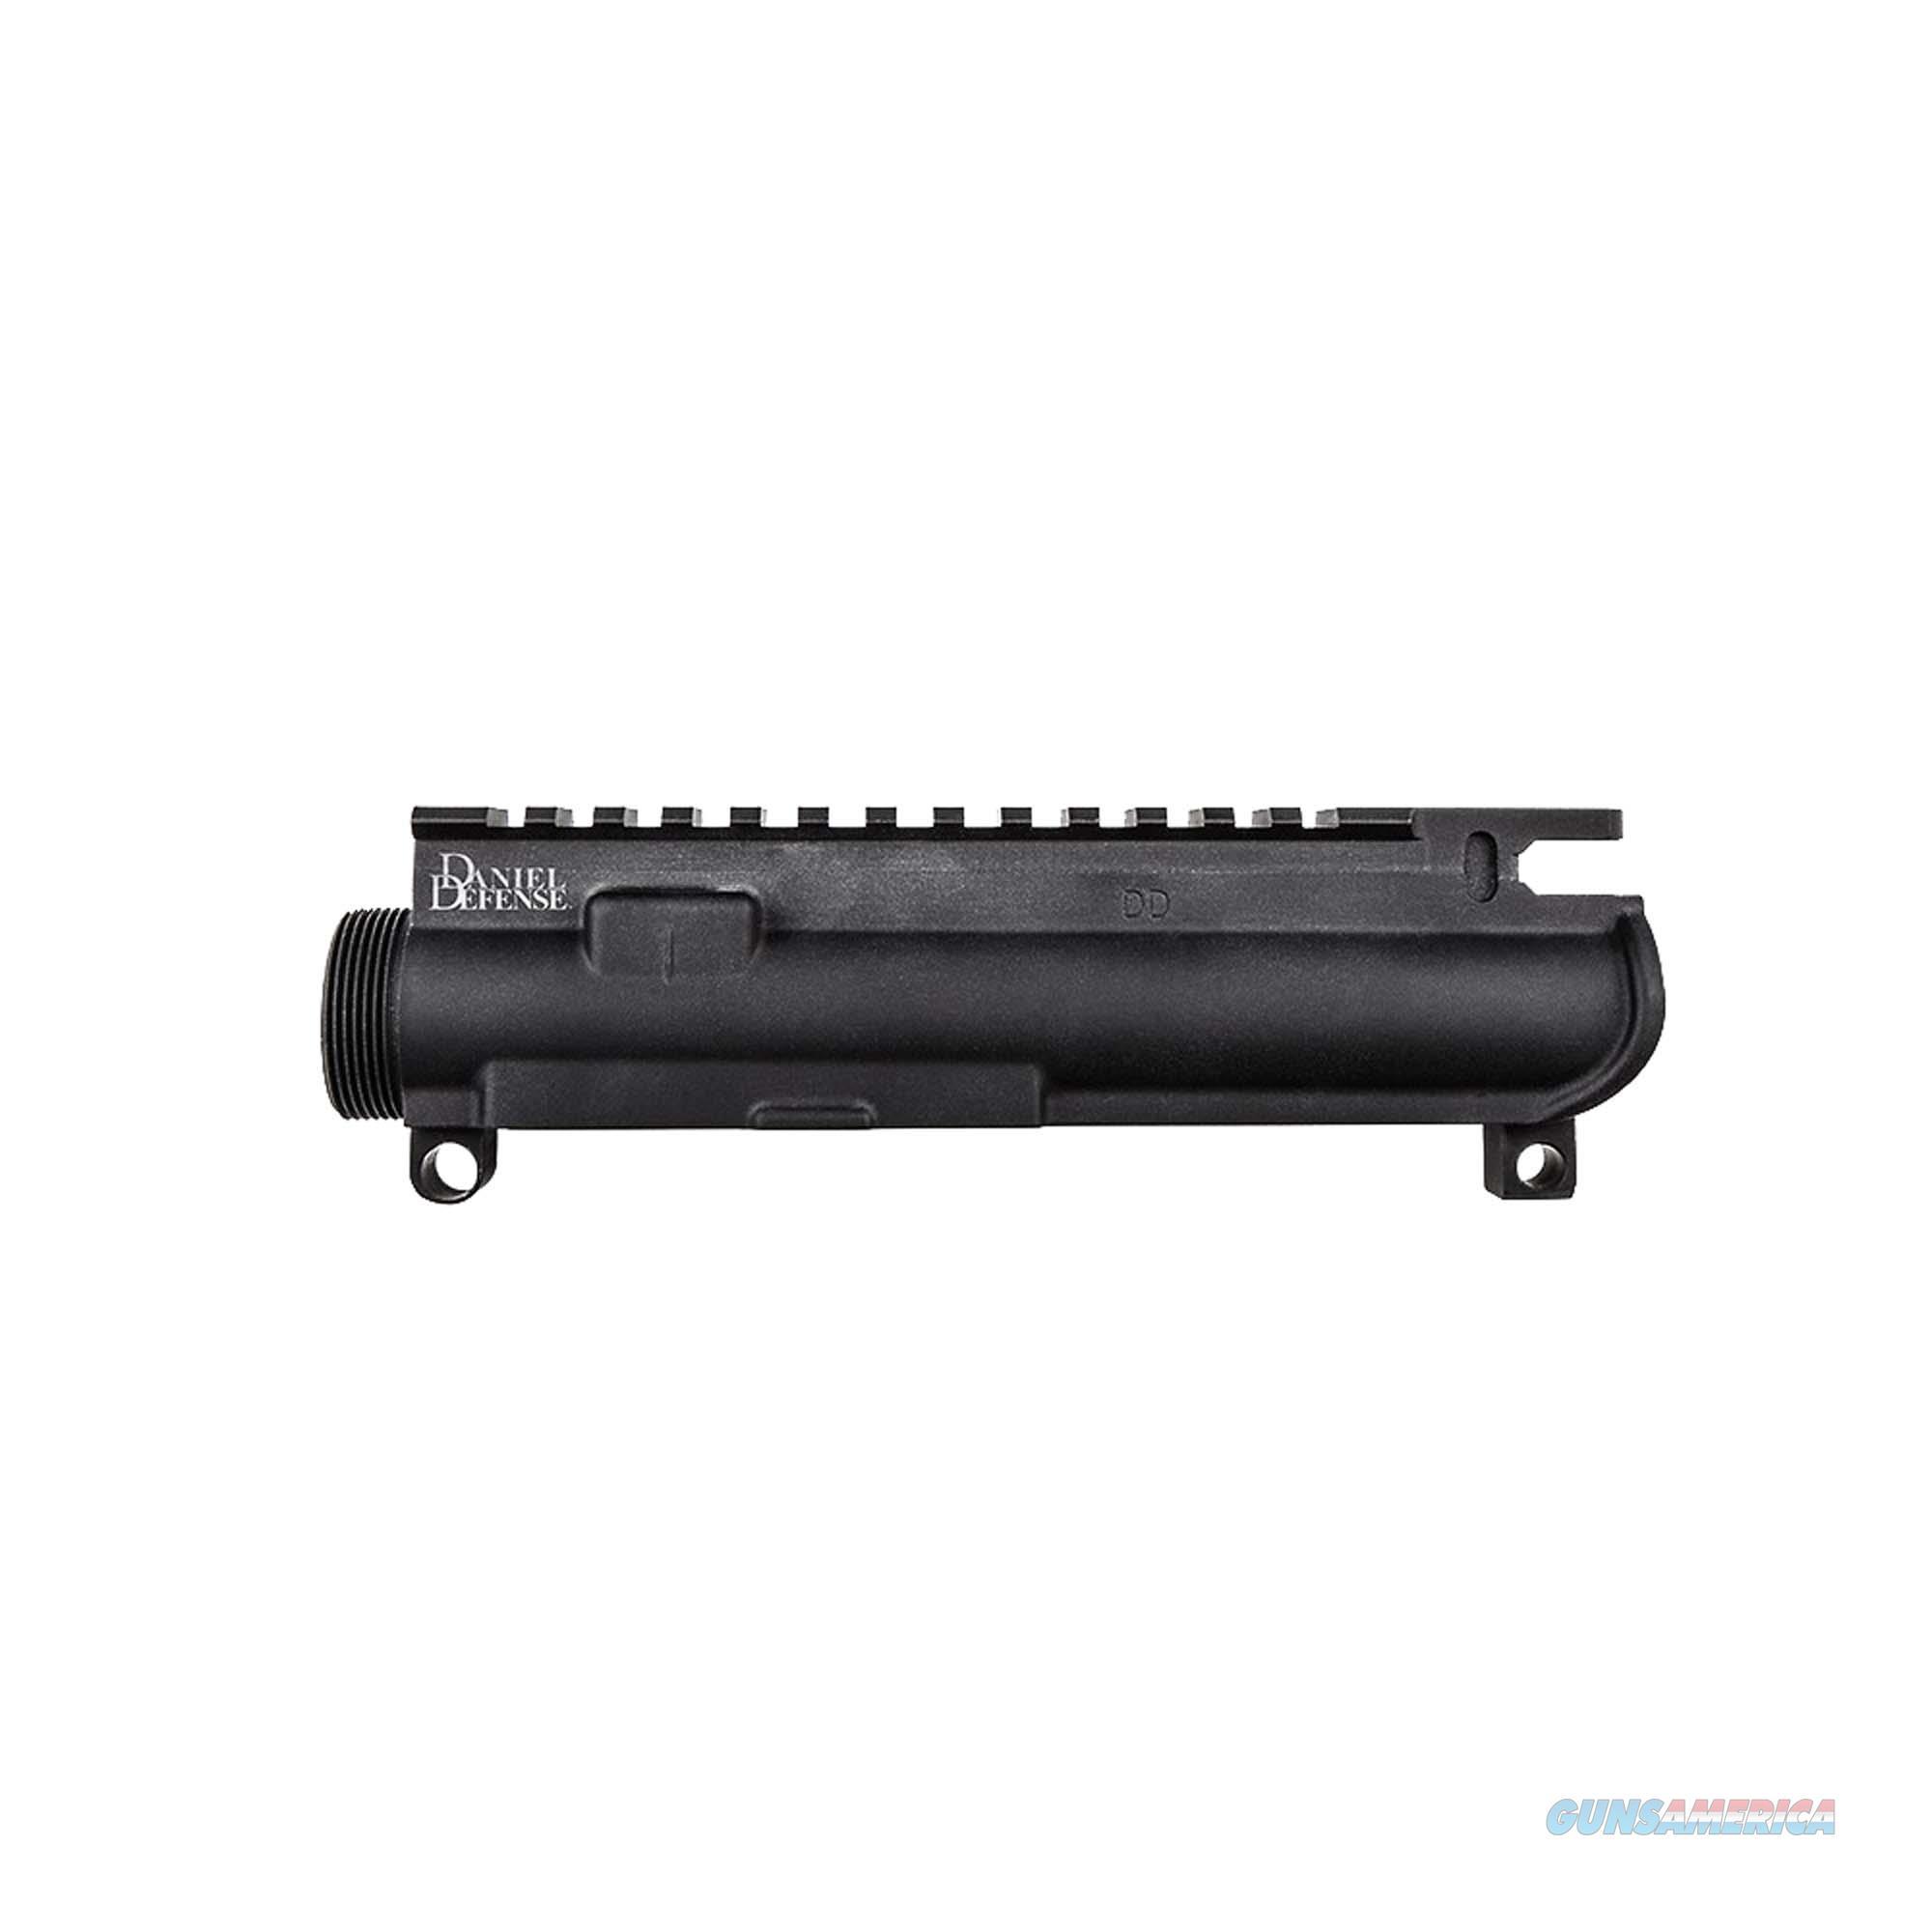 Daniel Defense Big Hole Upper Receiver W/Feed Ramps 04-012-09001  Non-Guns > Gun Parts > Misc > Rifles